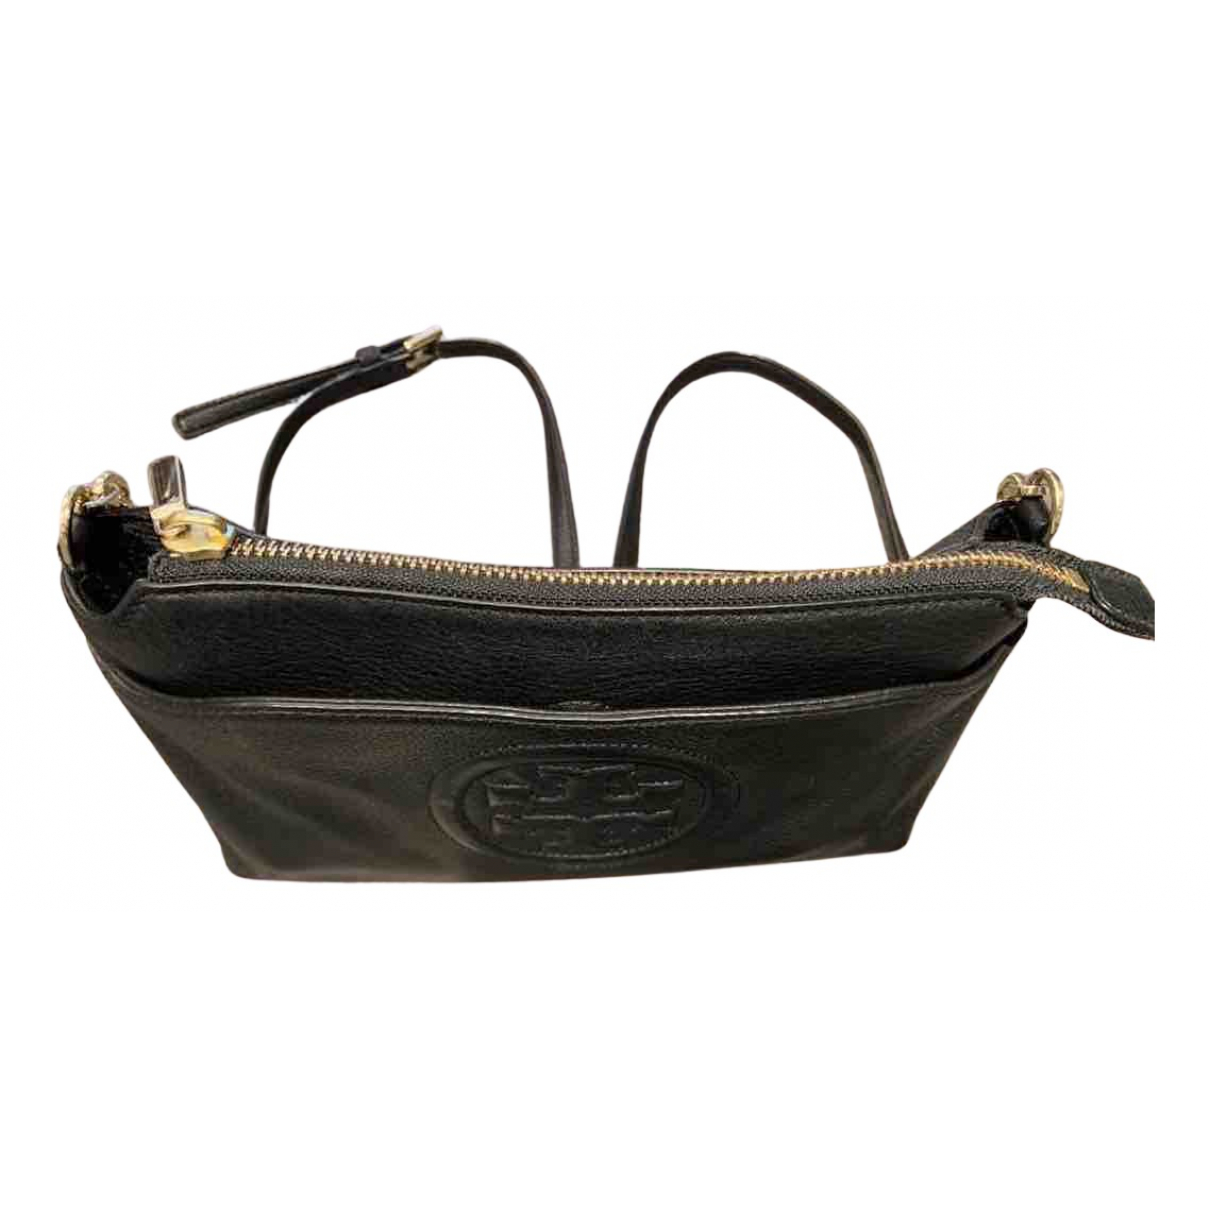 Tory Burch N Black Leather handbag for Women N